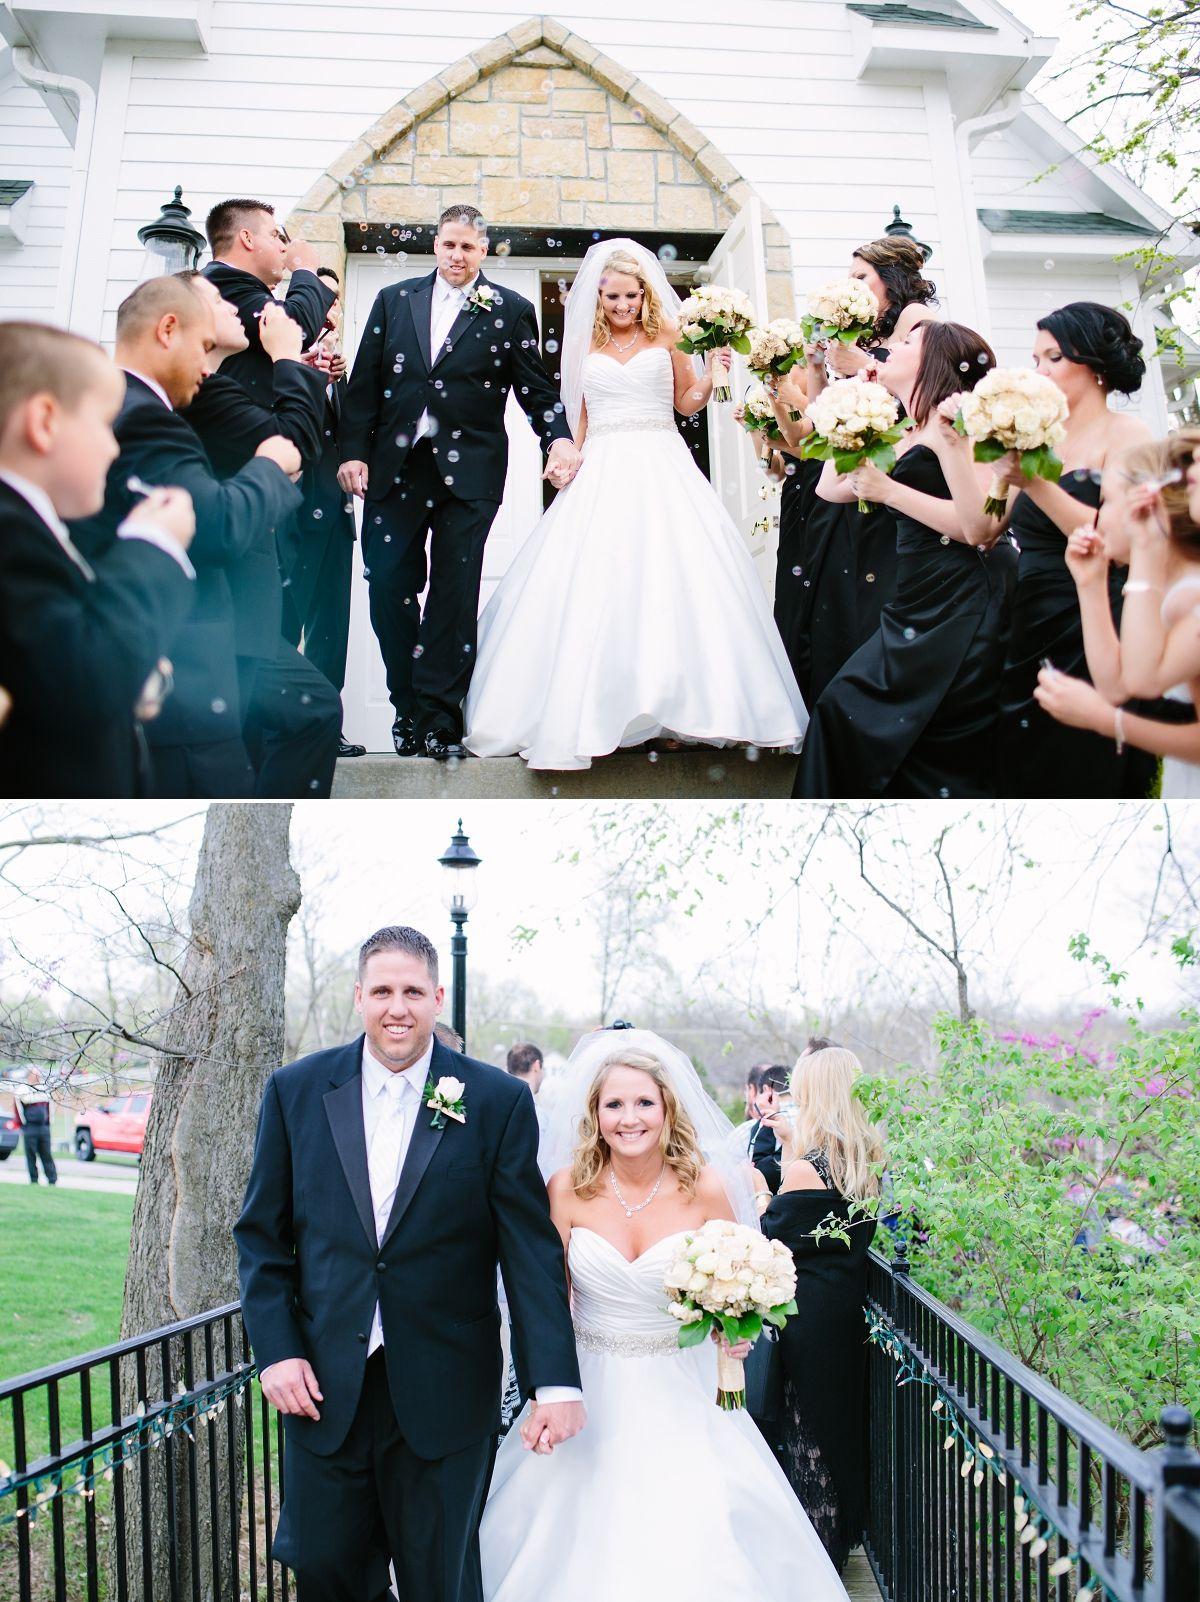 Angie And Joeys Hawthorne House Wedding In Parkville Missouri